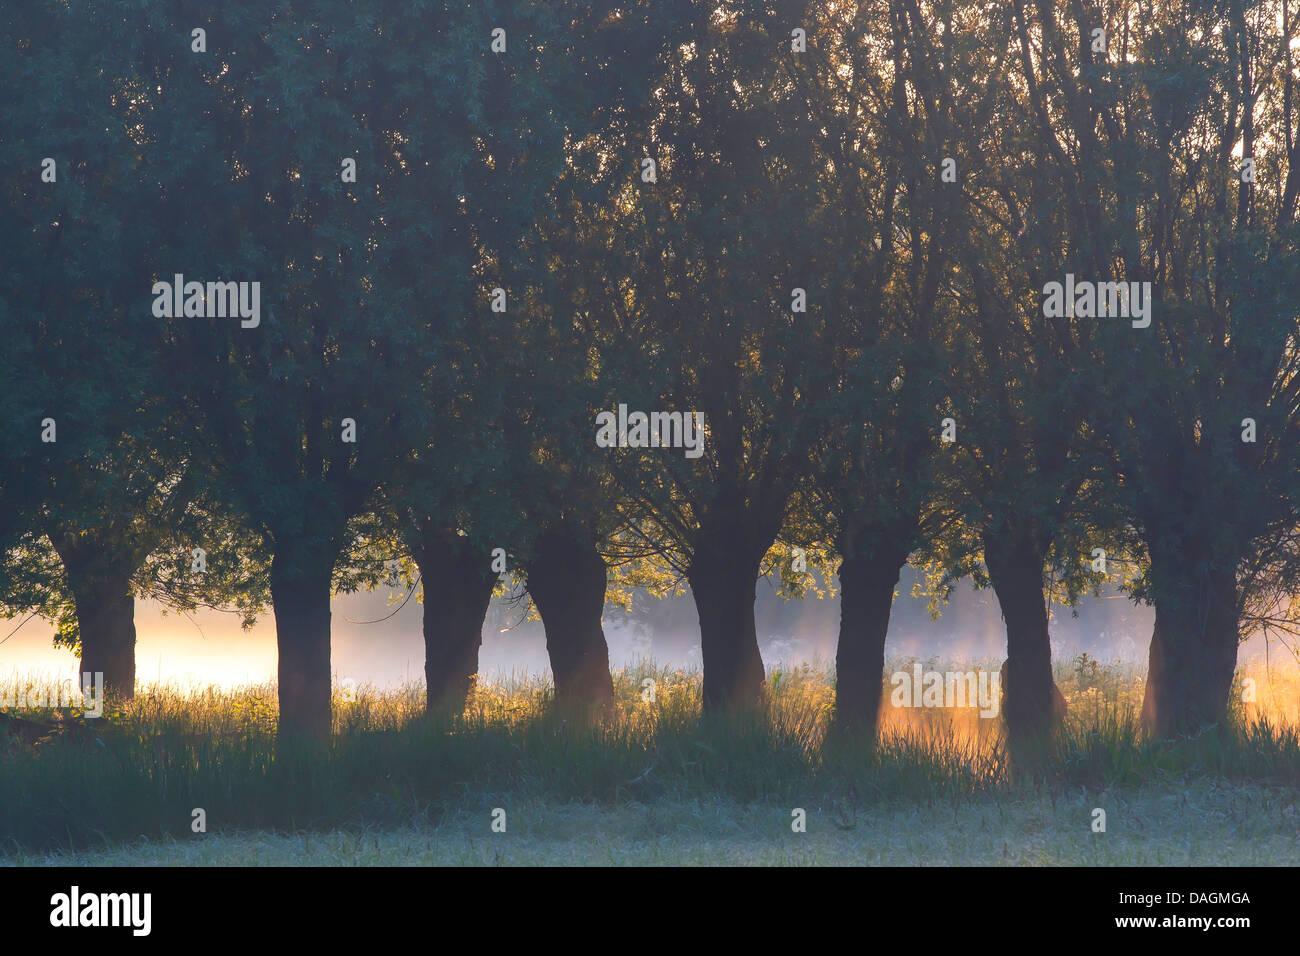 willow, osier (Salix spec.), row of pollard willow trees, Belgium - Stock Image